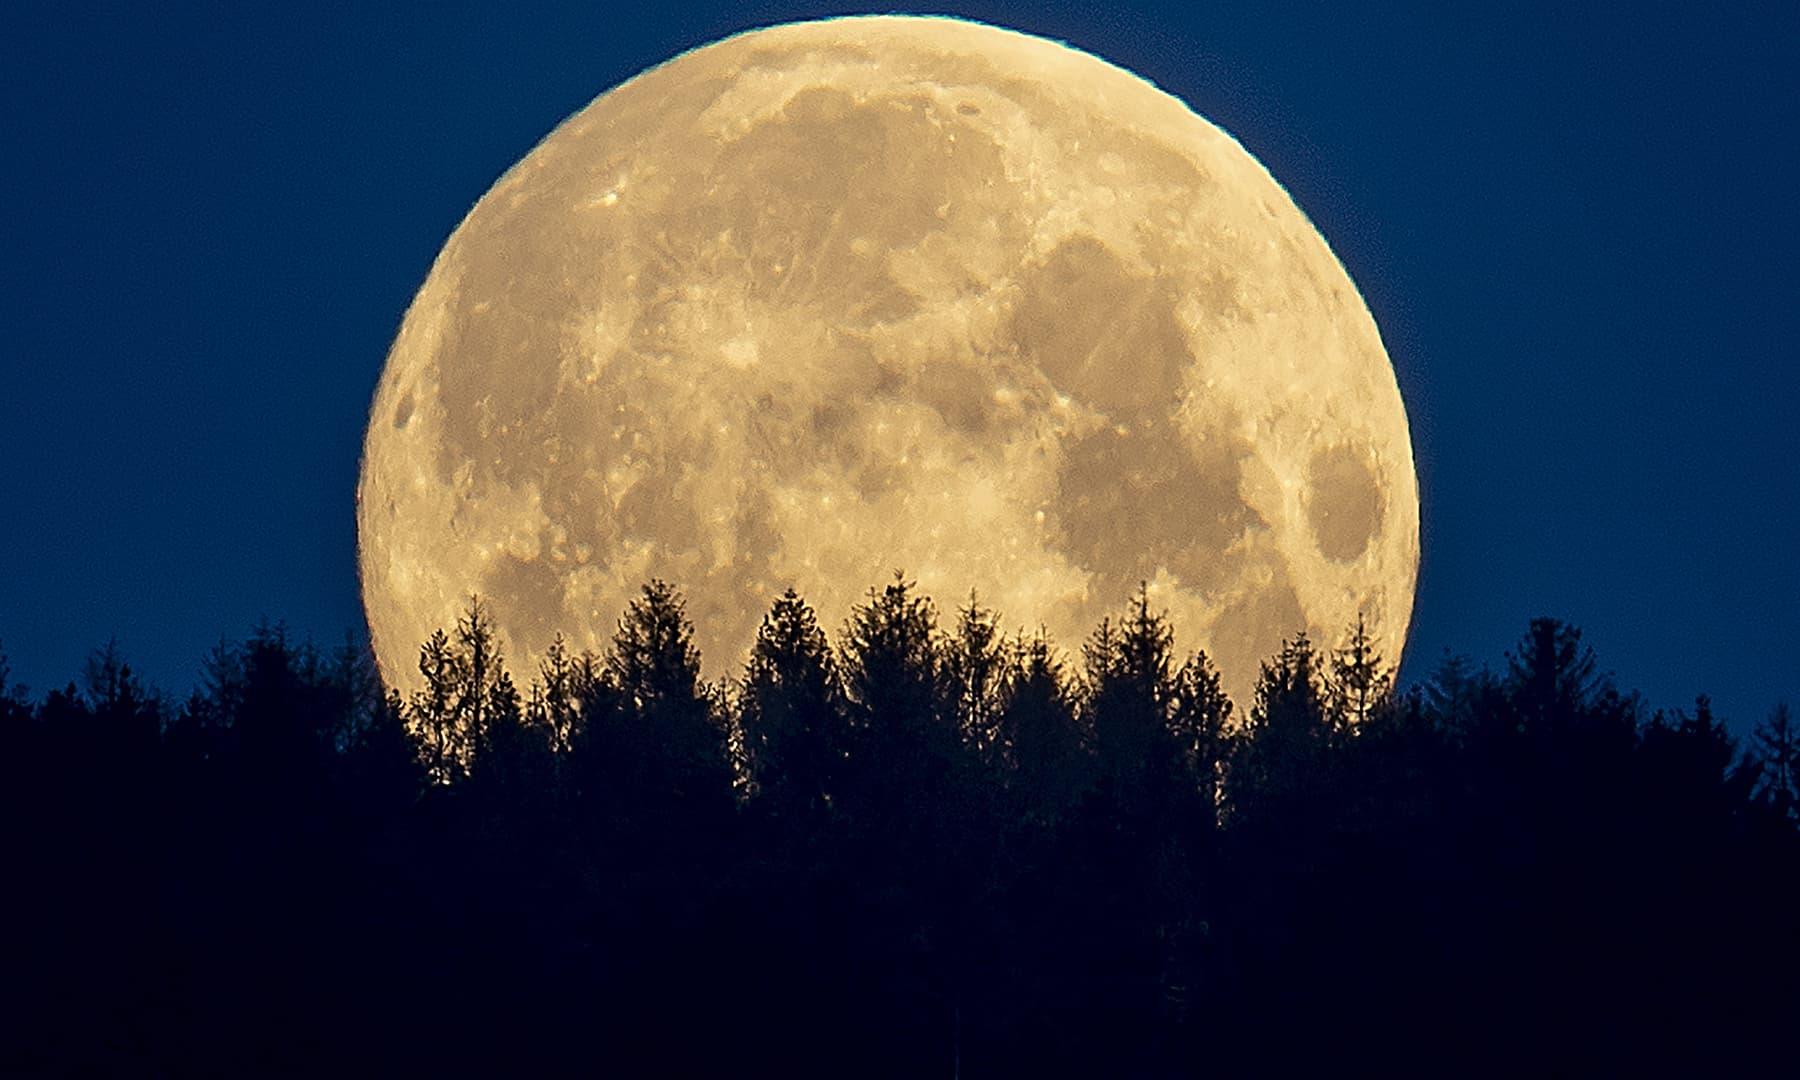 The full moon sets behind trees in the Taunus region near Frankfurt, Germany, Thursday. — AP